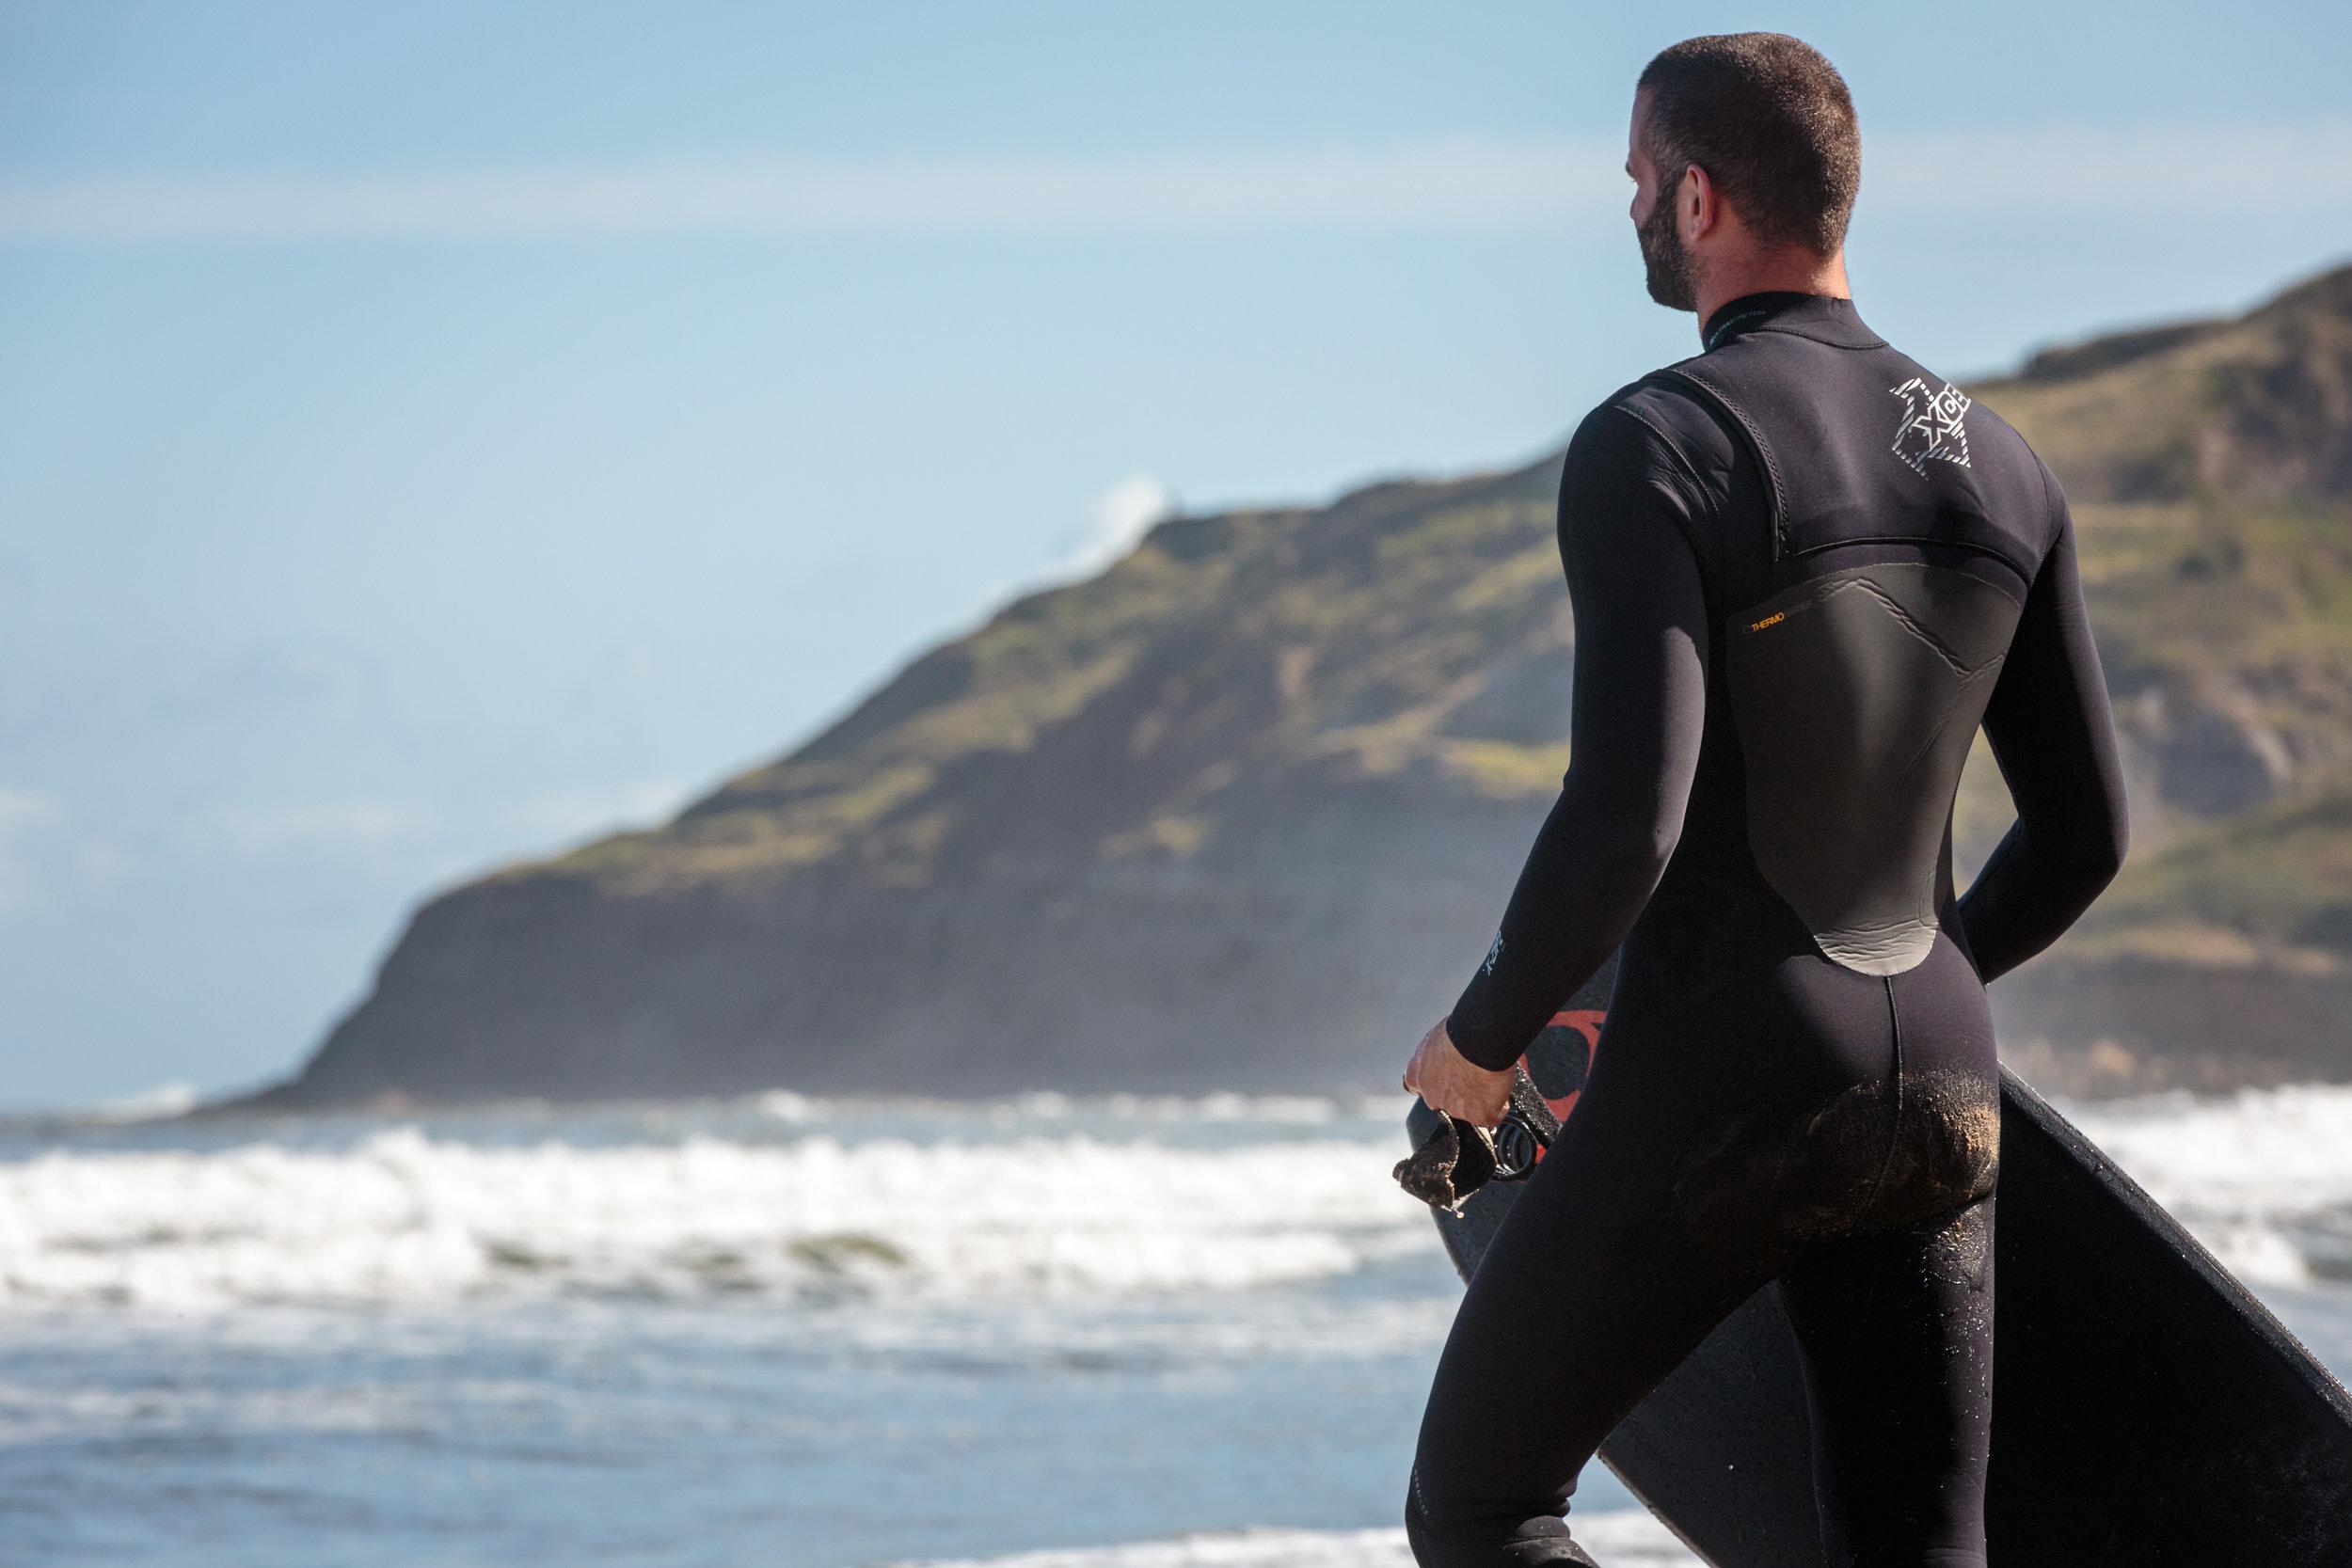 Bodyboarder Walking to Sea